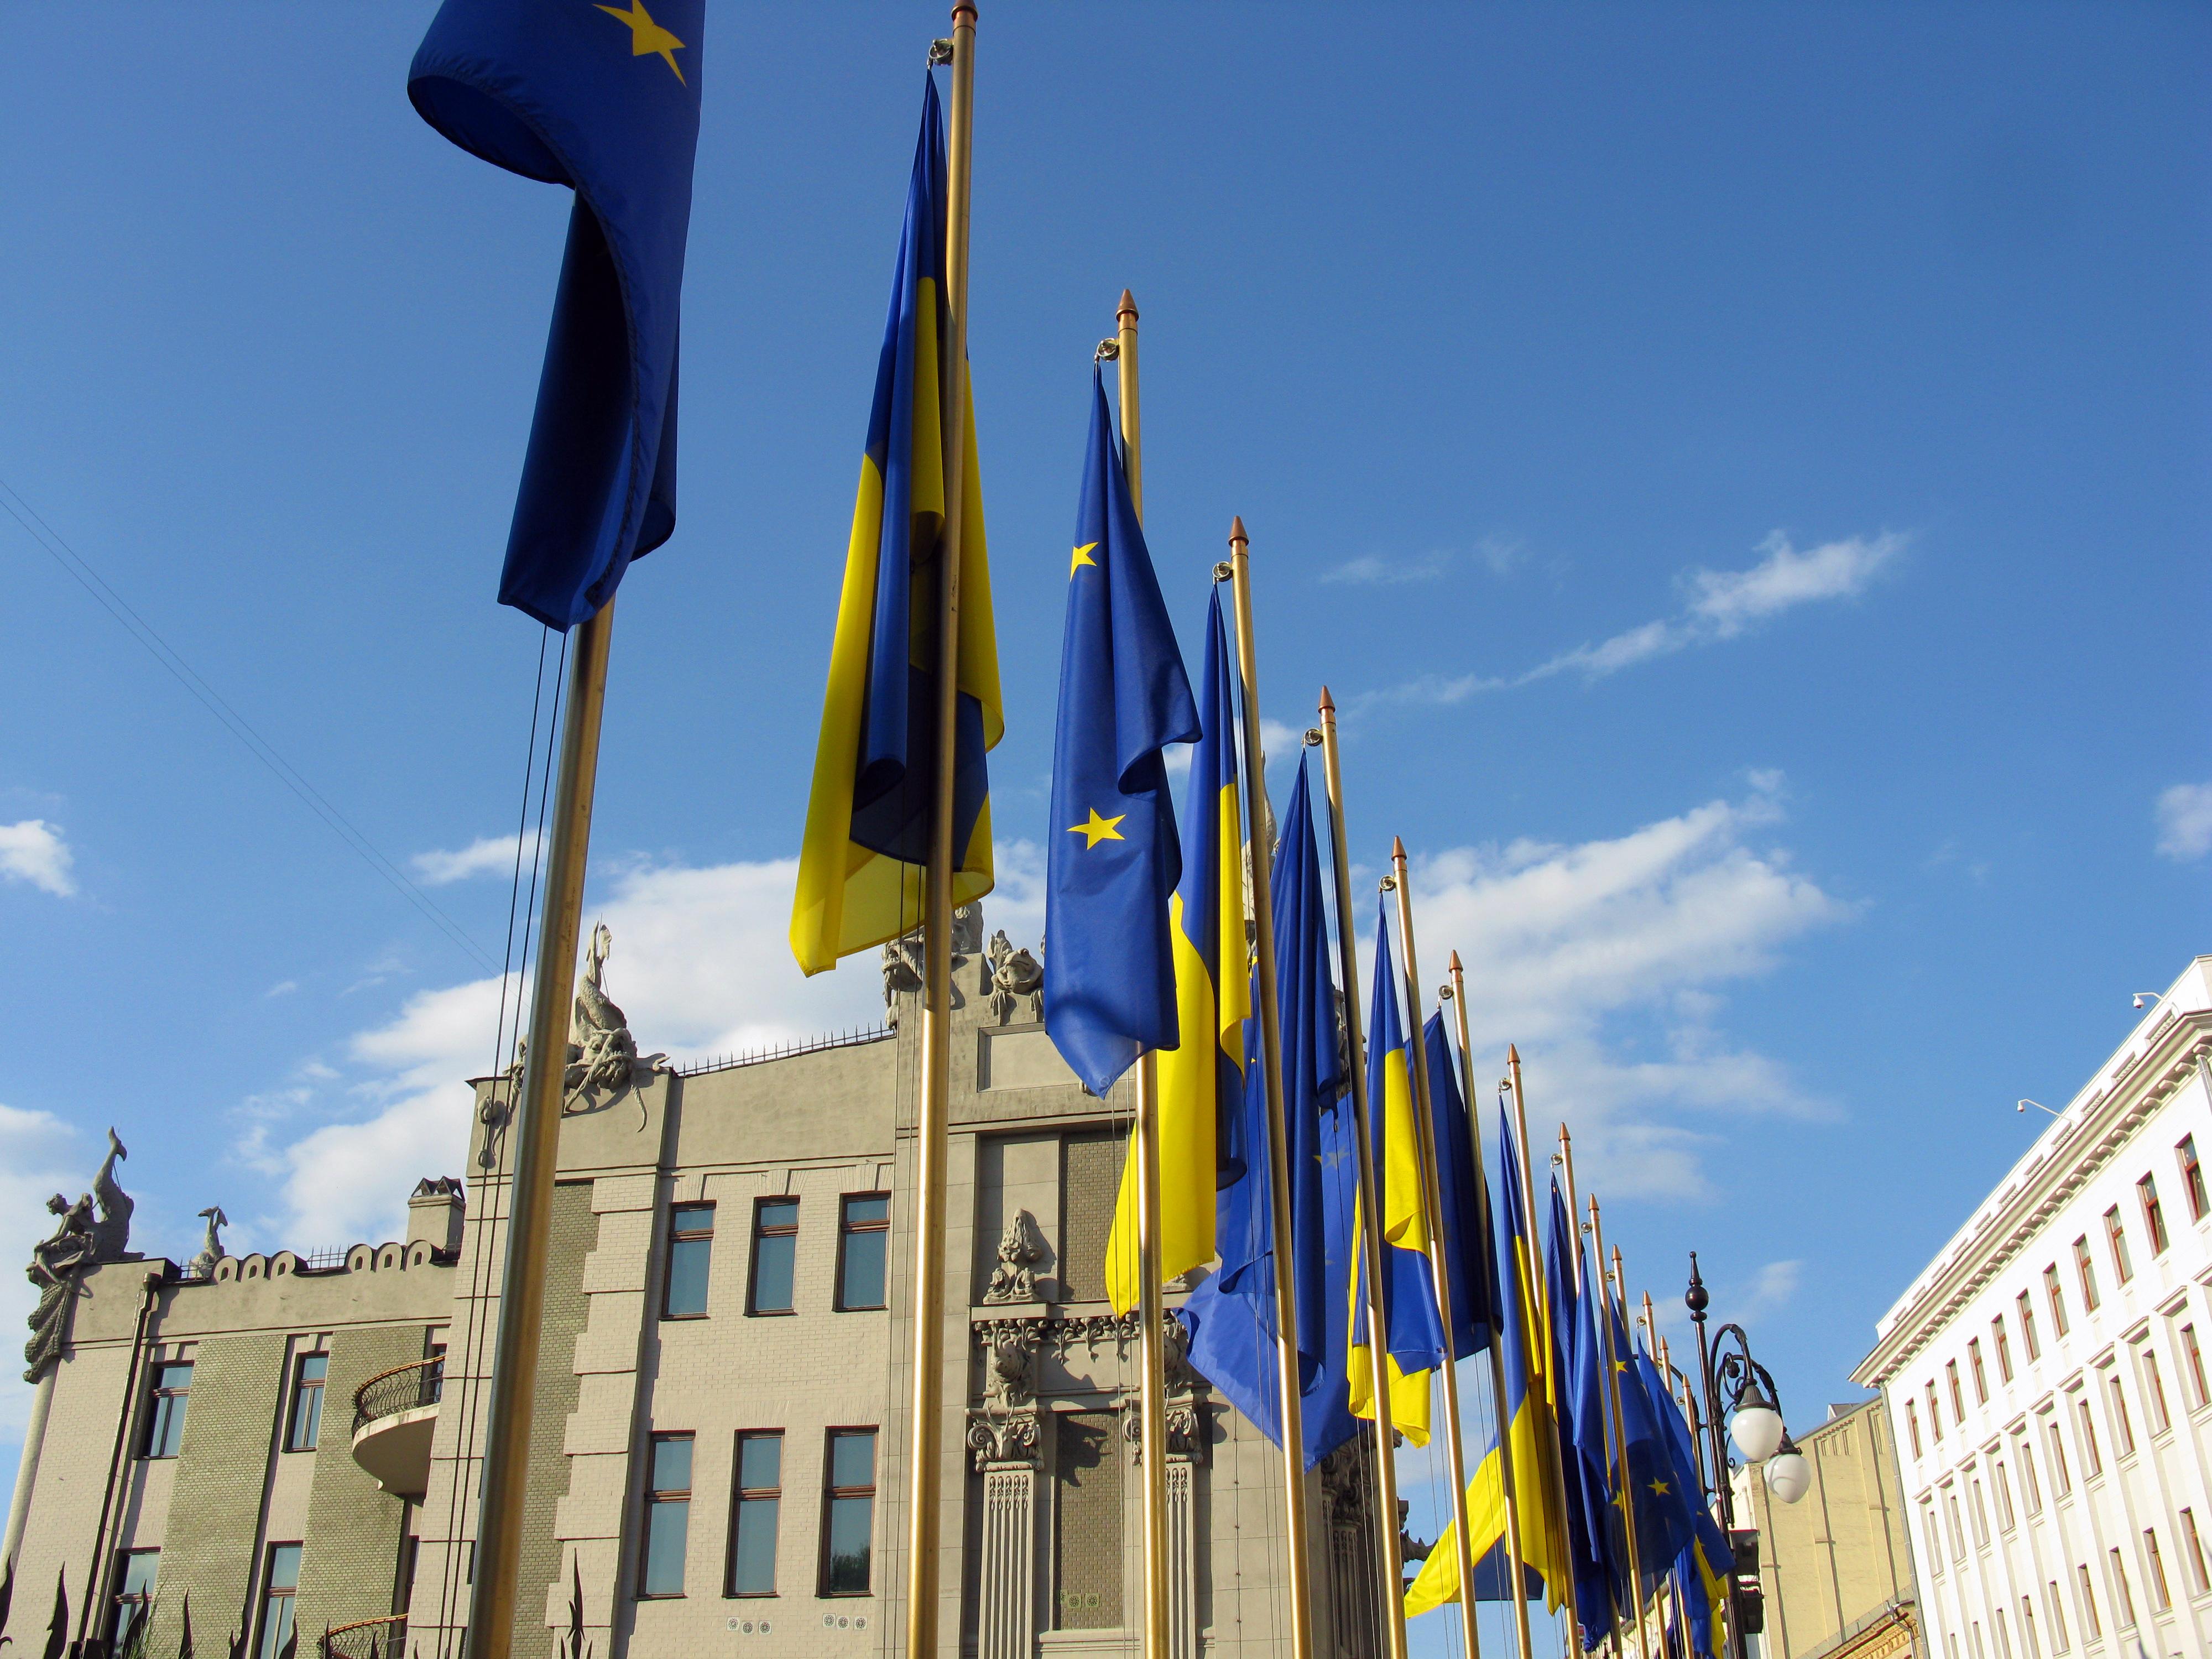 Flags_of_EU_and_Ukraine.jpg